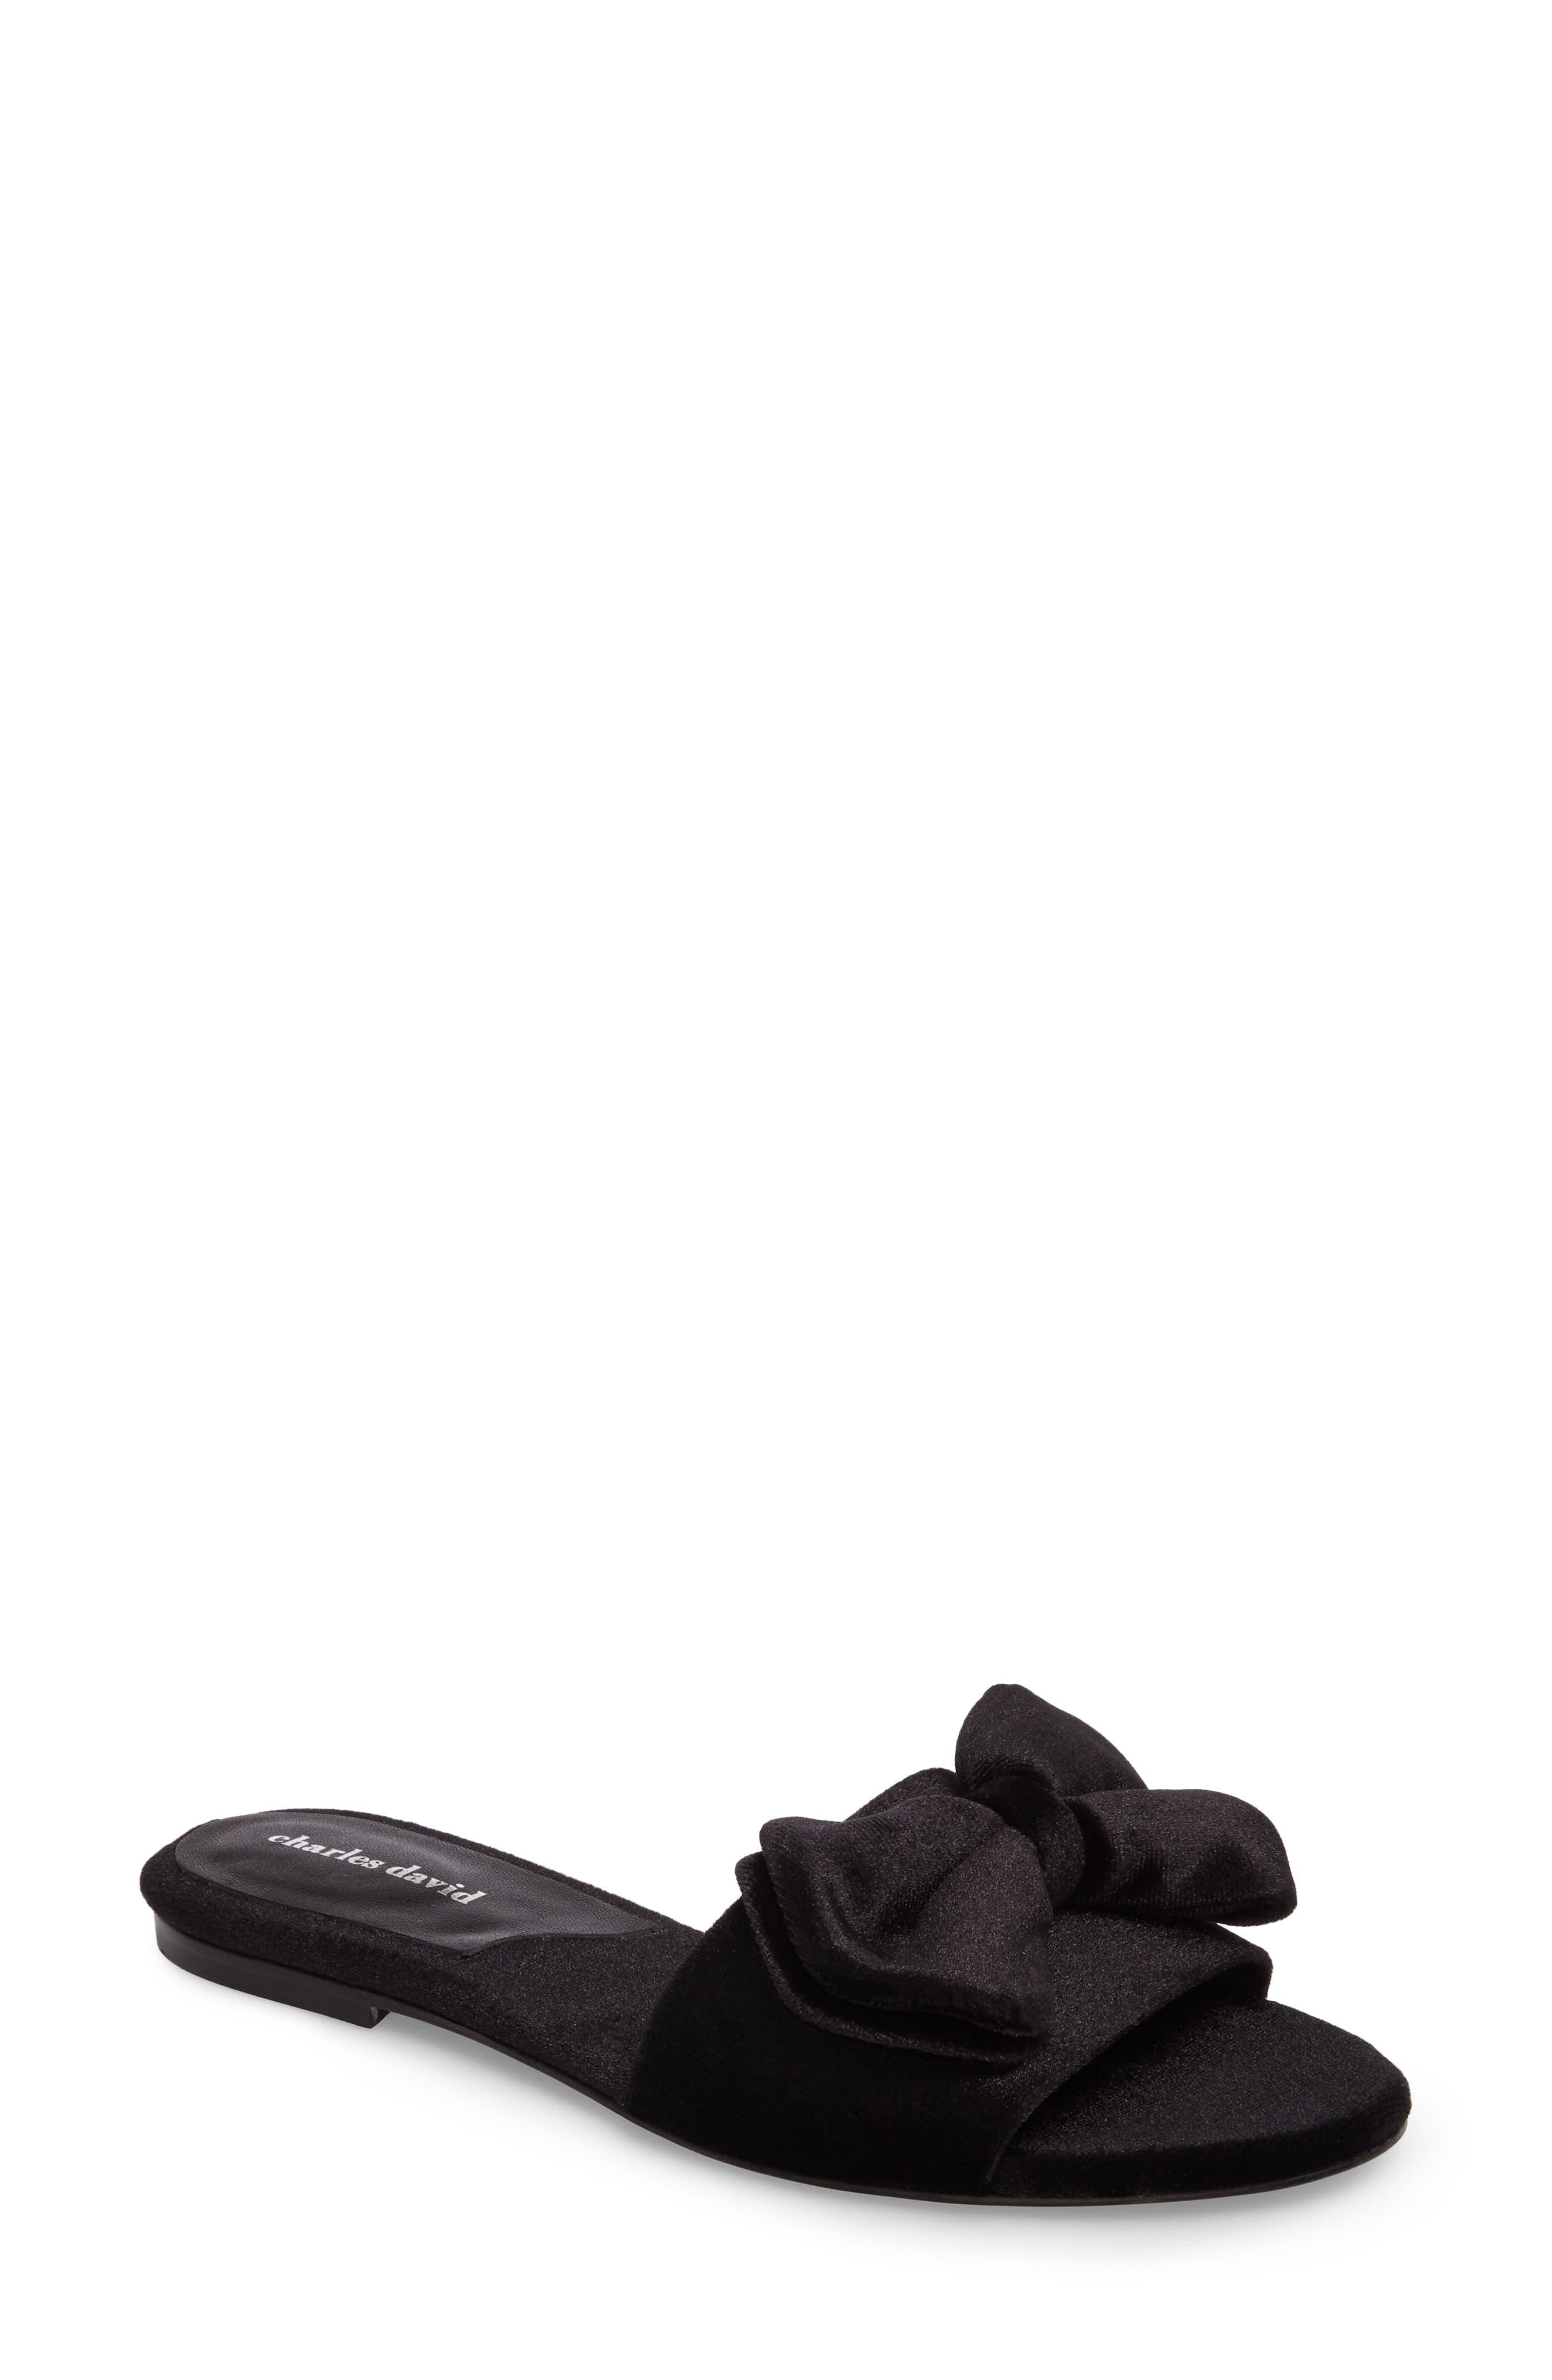 Bow Slide Sandal,                         Main,                         color,